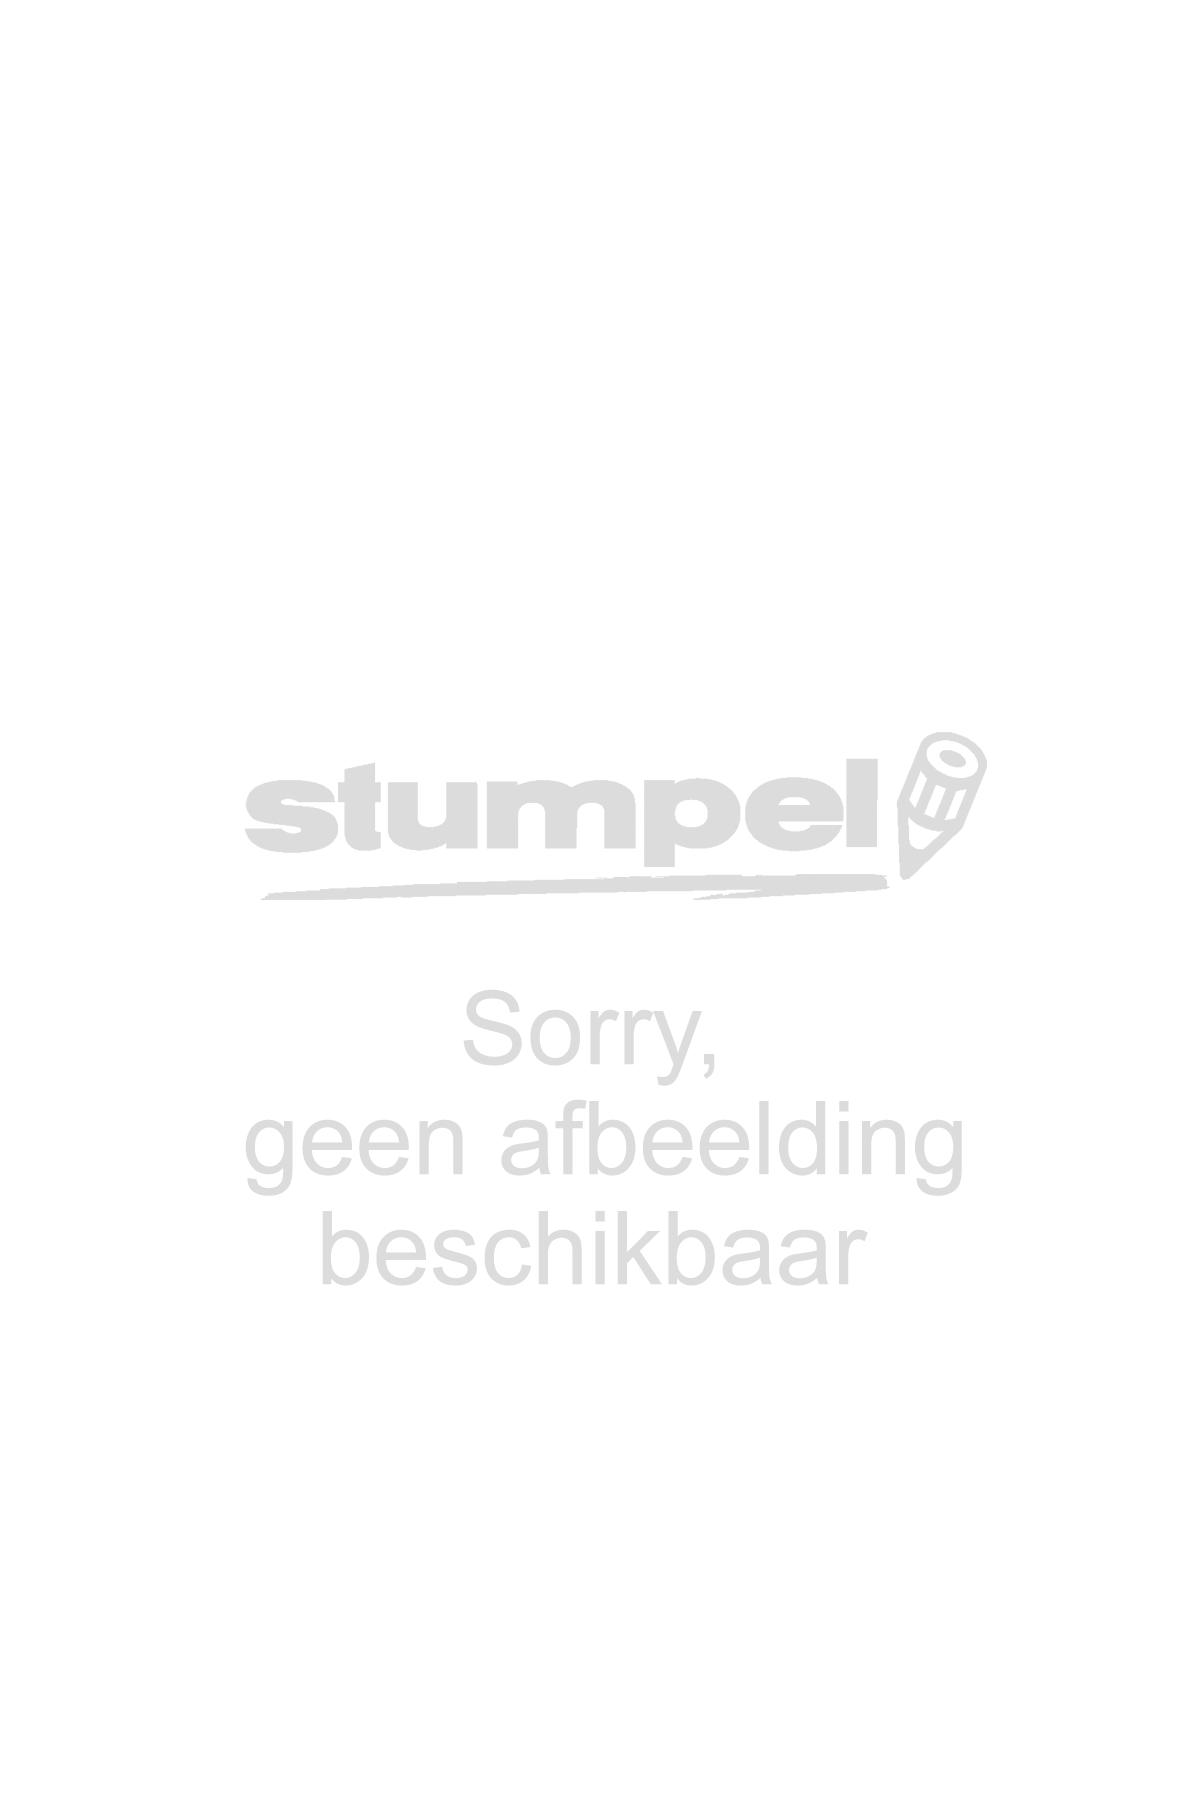 vulpen-lamy-009-abc-f-blauw-600005